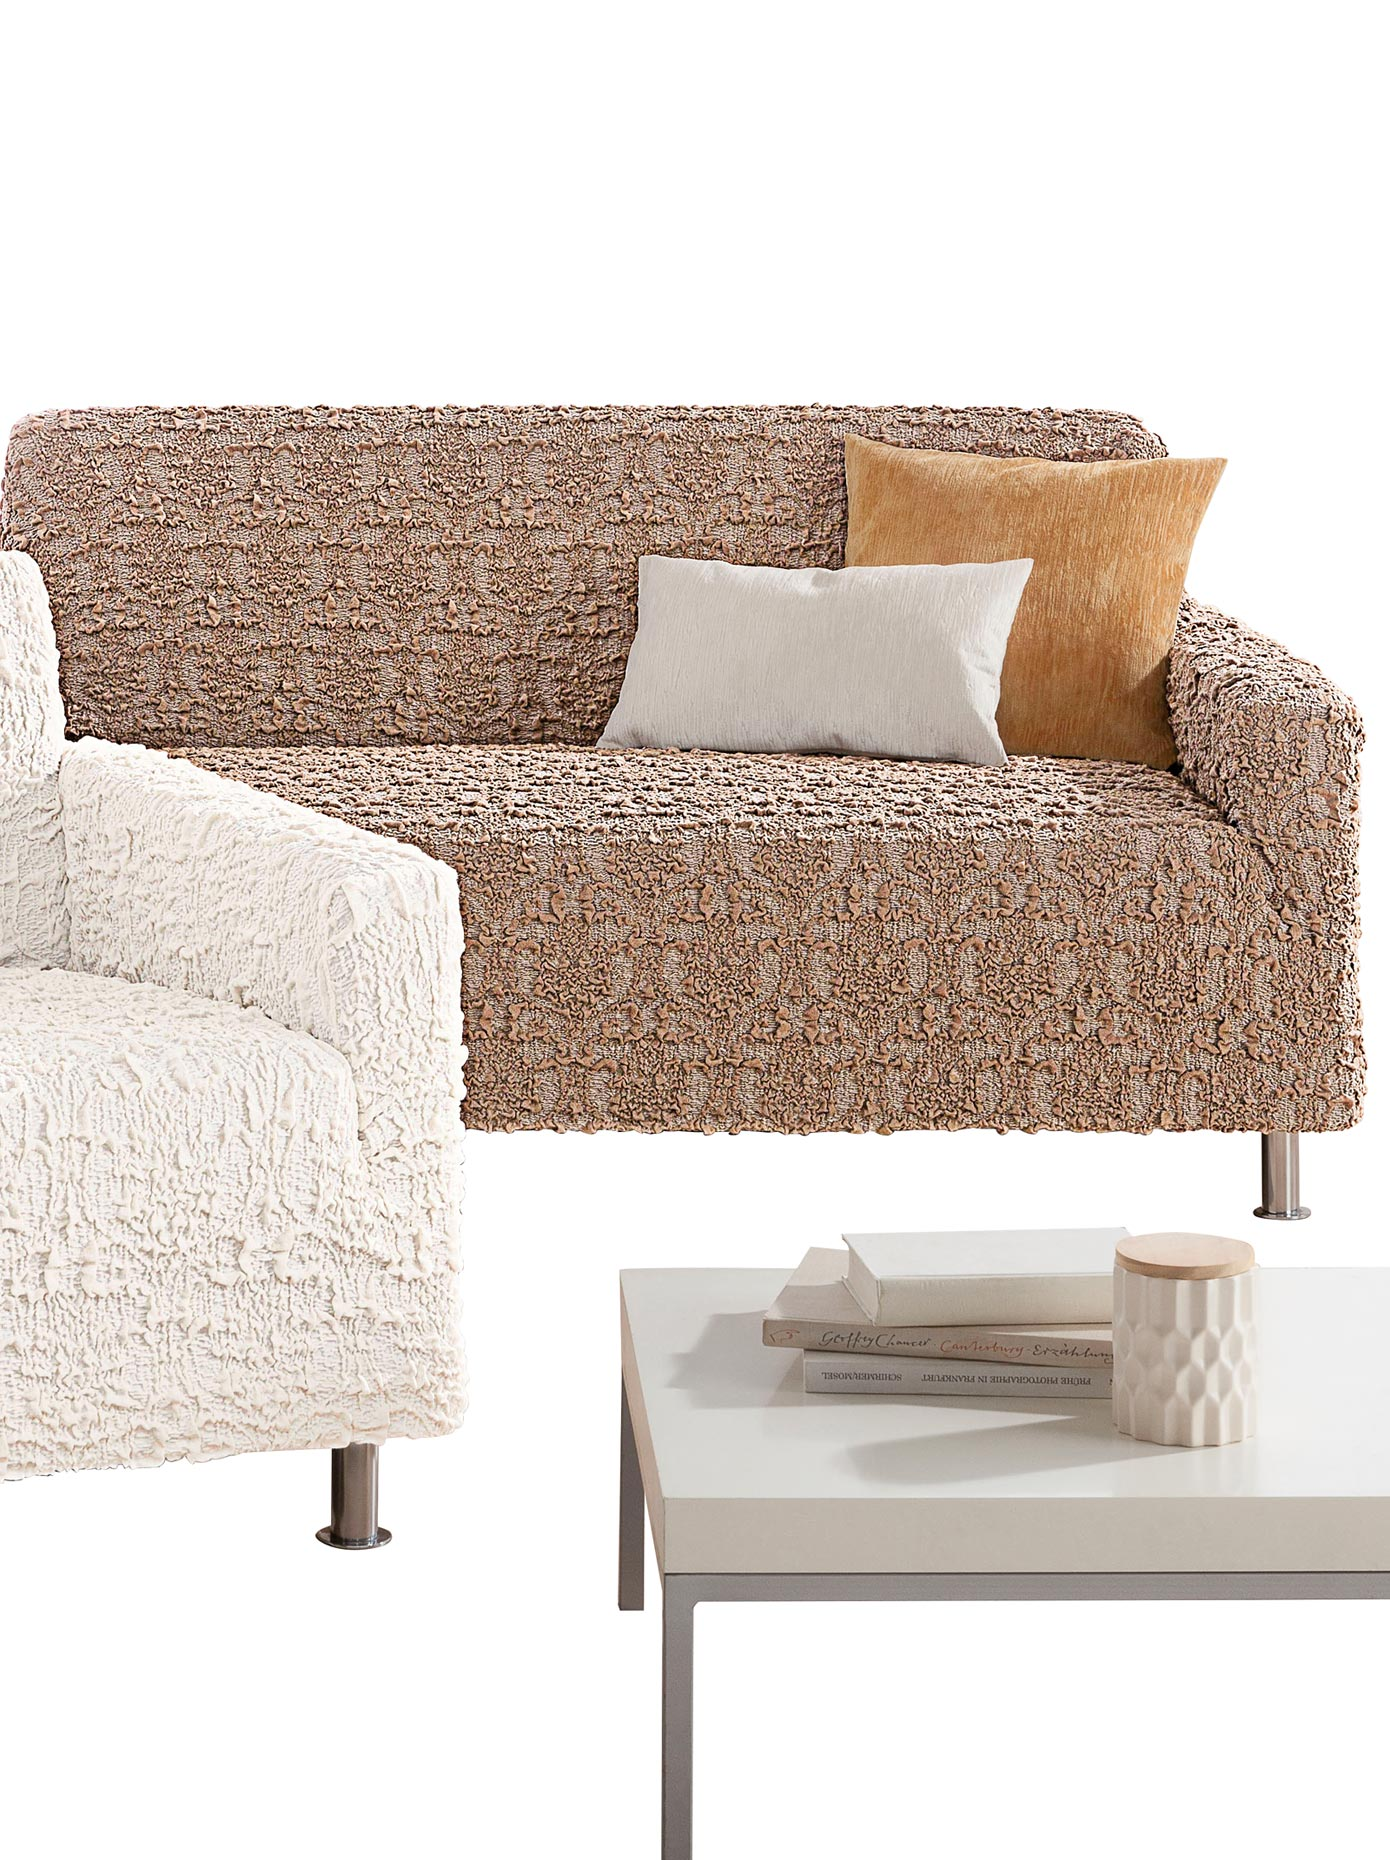 hussenprogramm auf rechnung baur. Black Bedroom Furniture Sets. Home Design Ideas